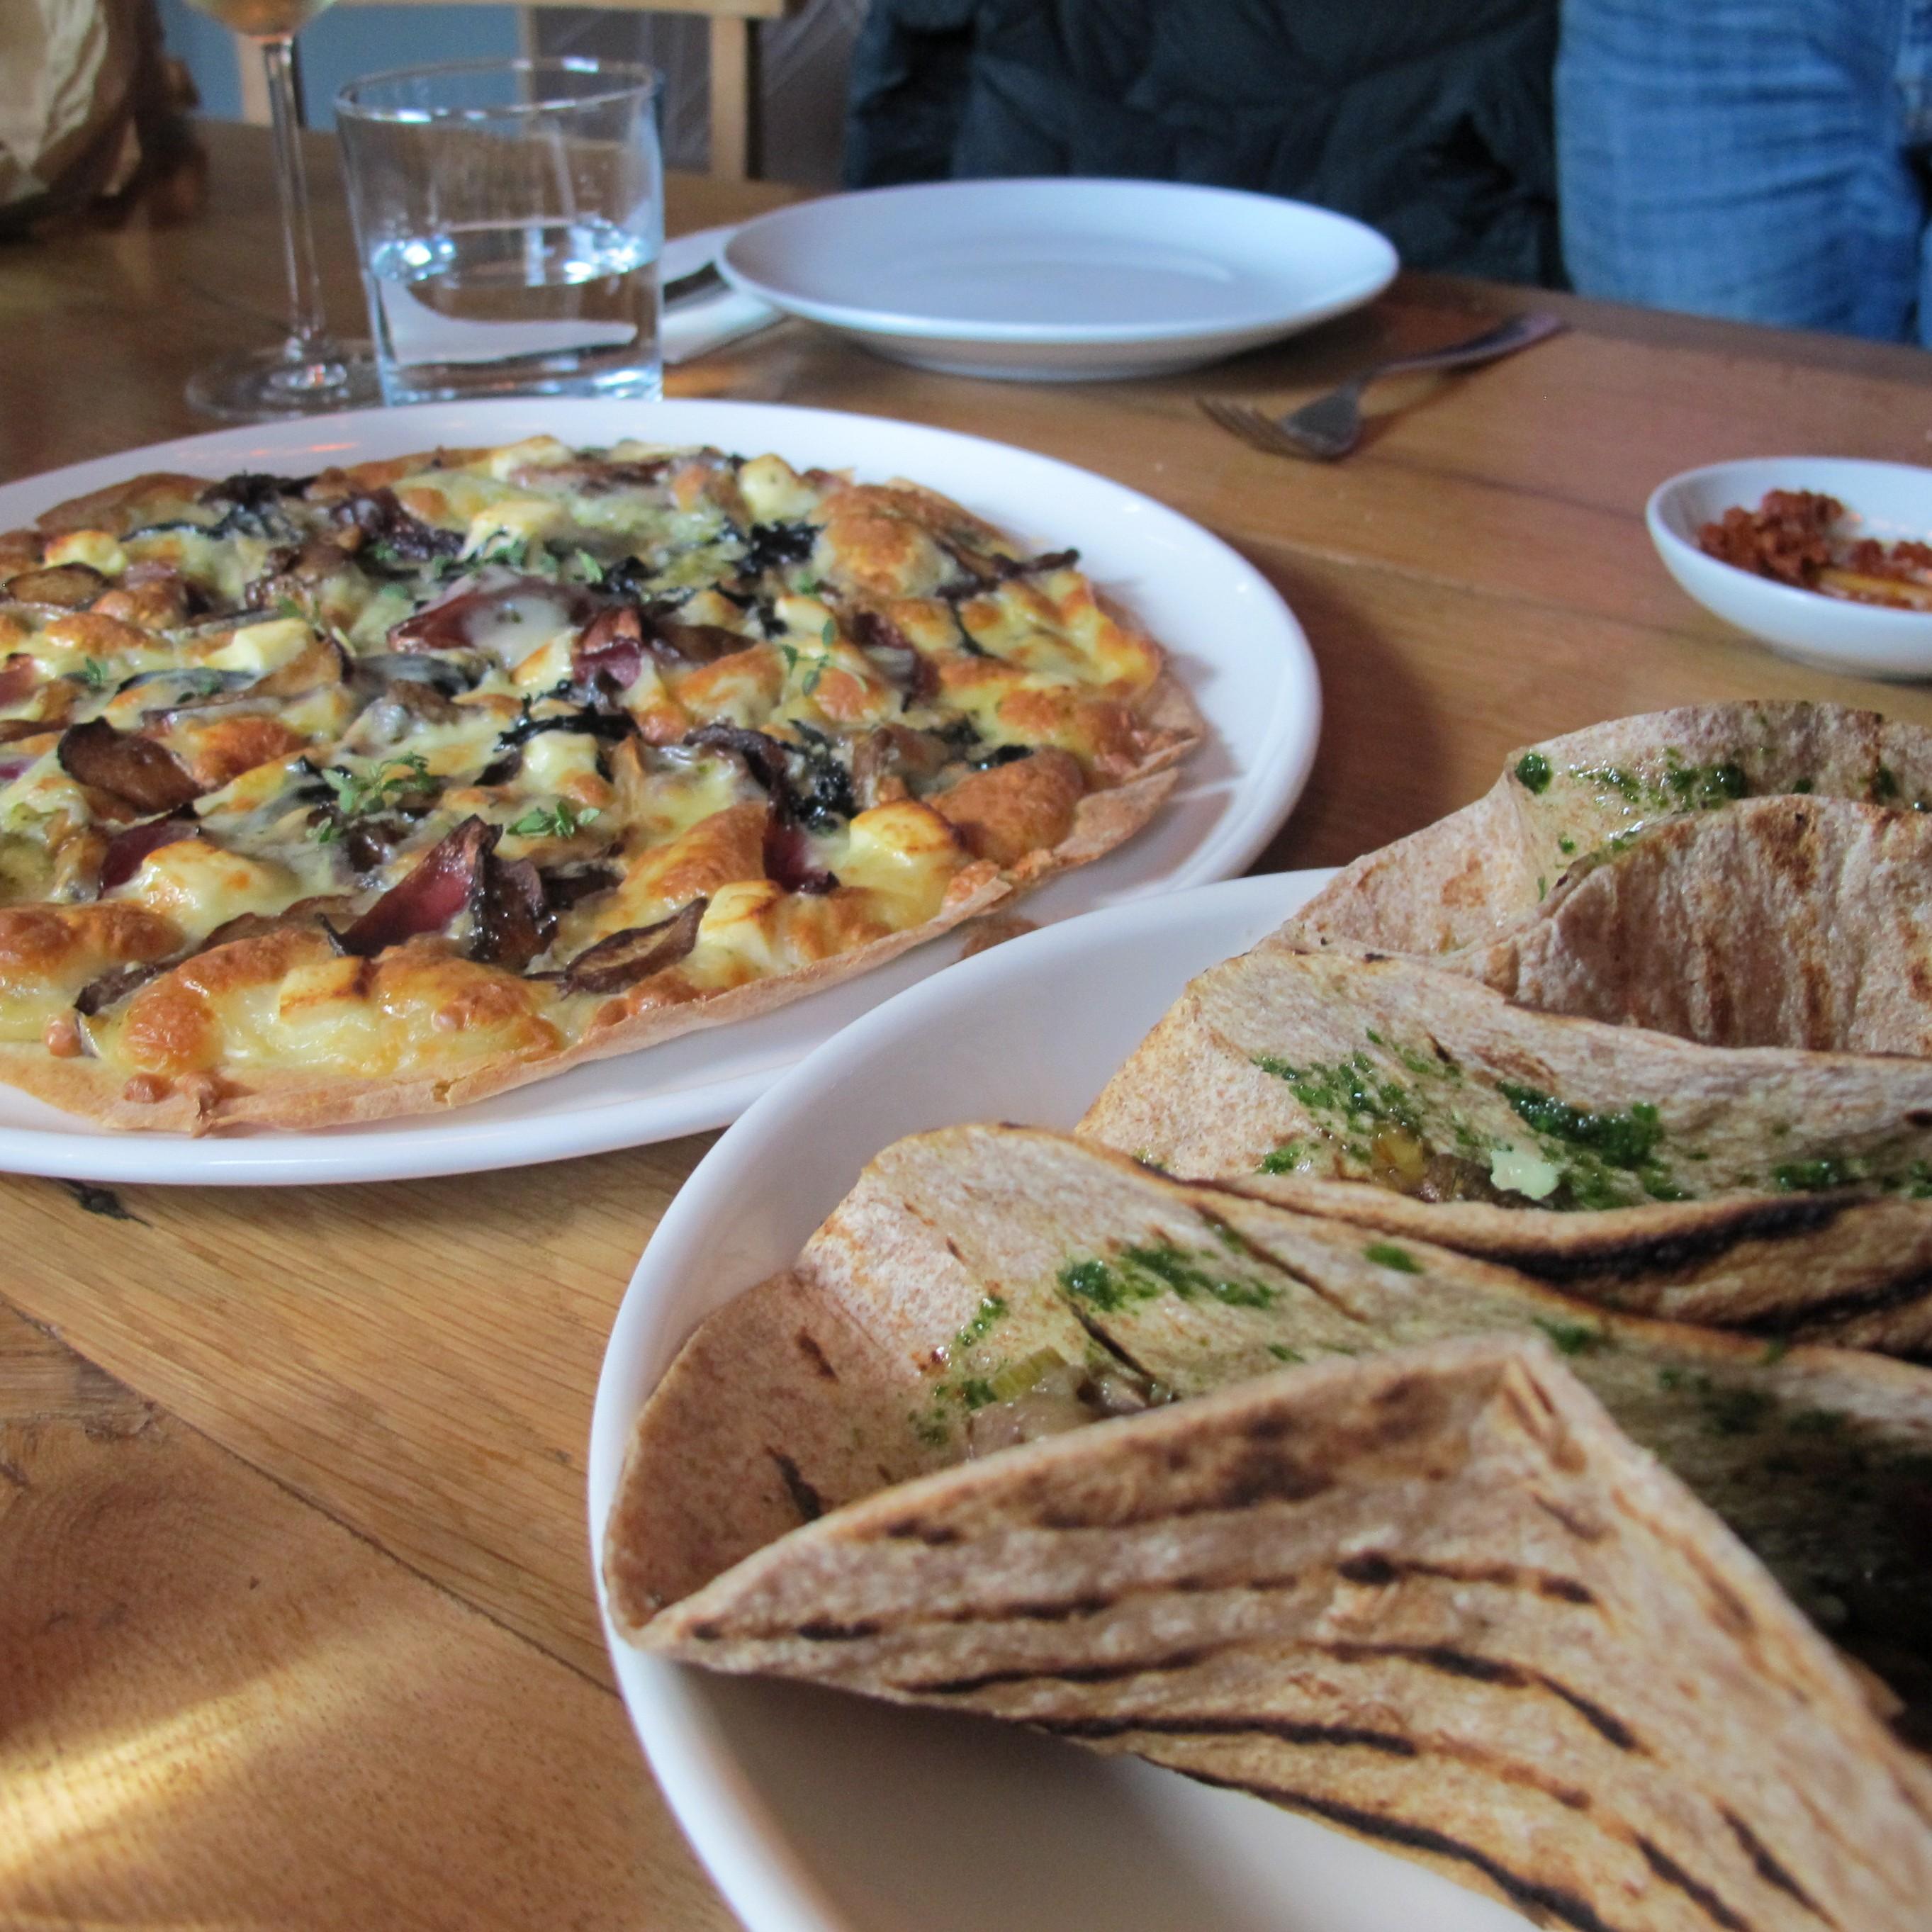 Pizzetta and Veggie Tacos